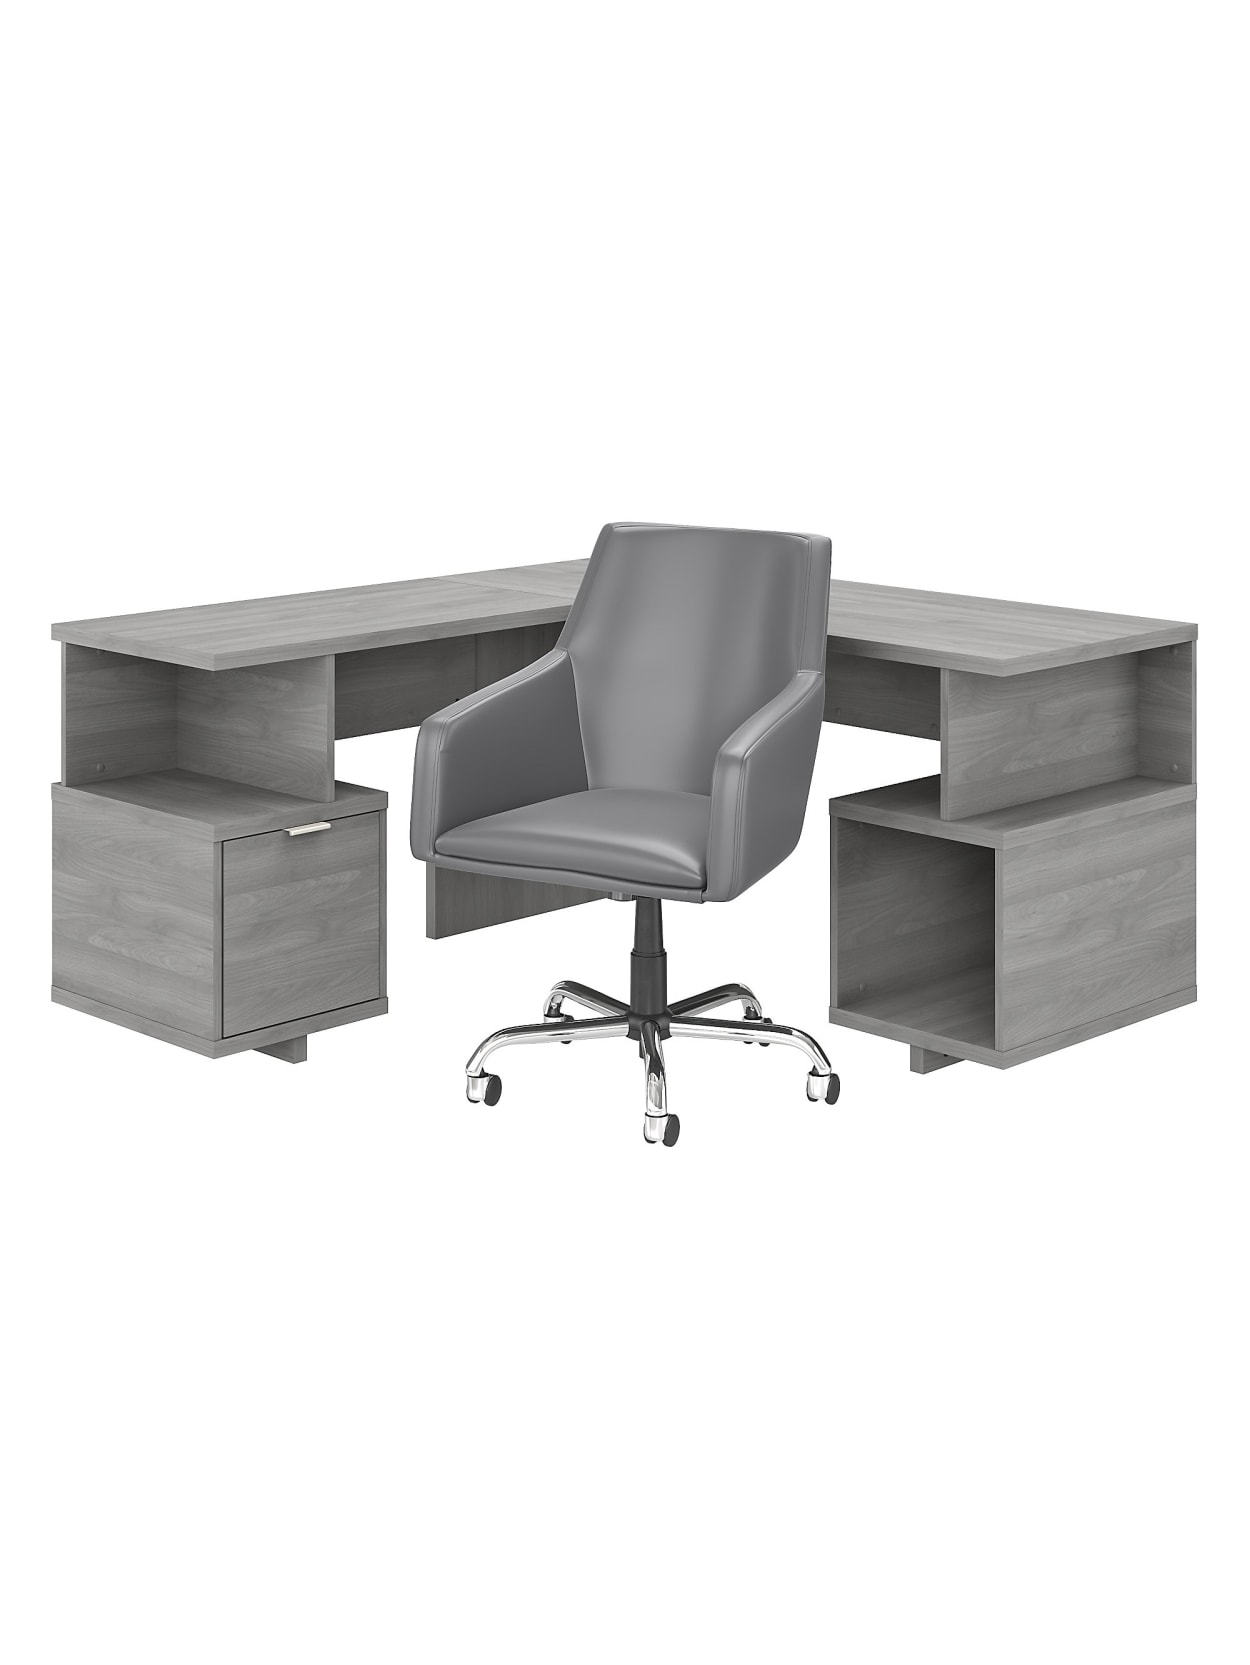 Bush Madison Ave 60 L Deskchair Gray Office Depot